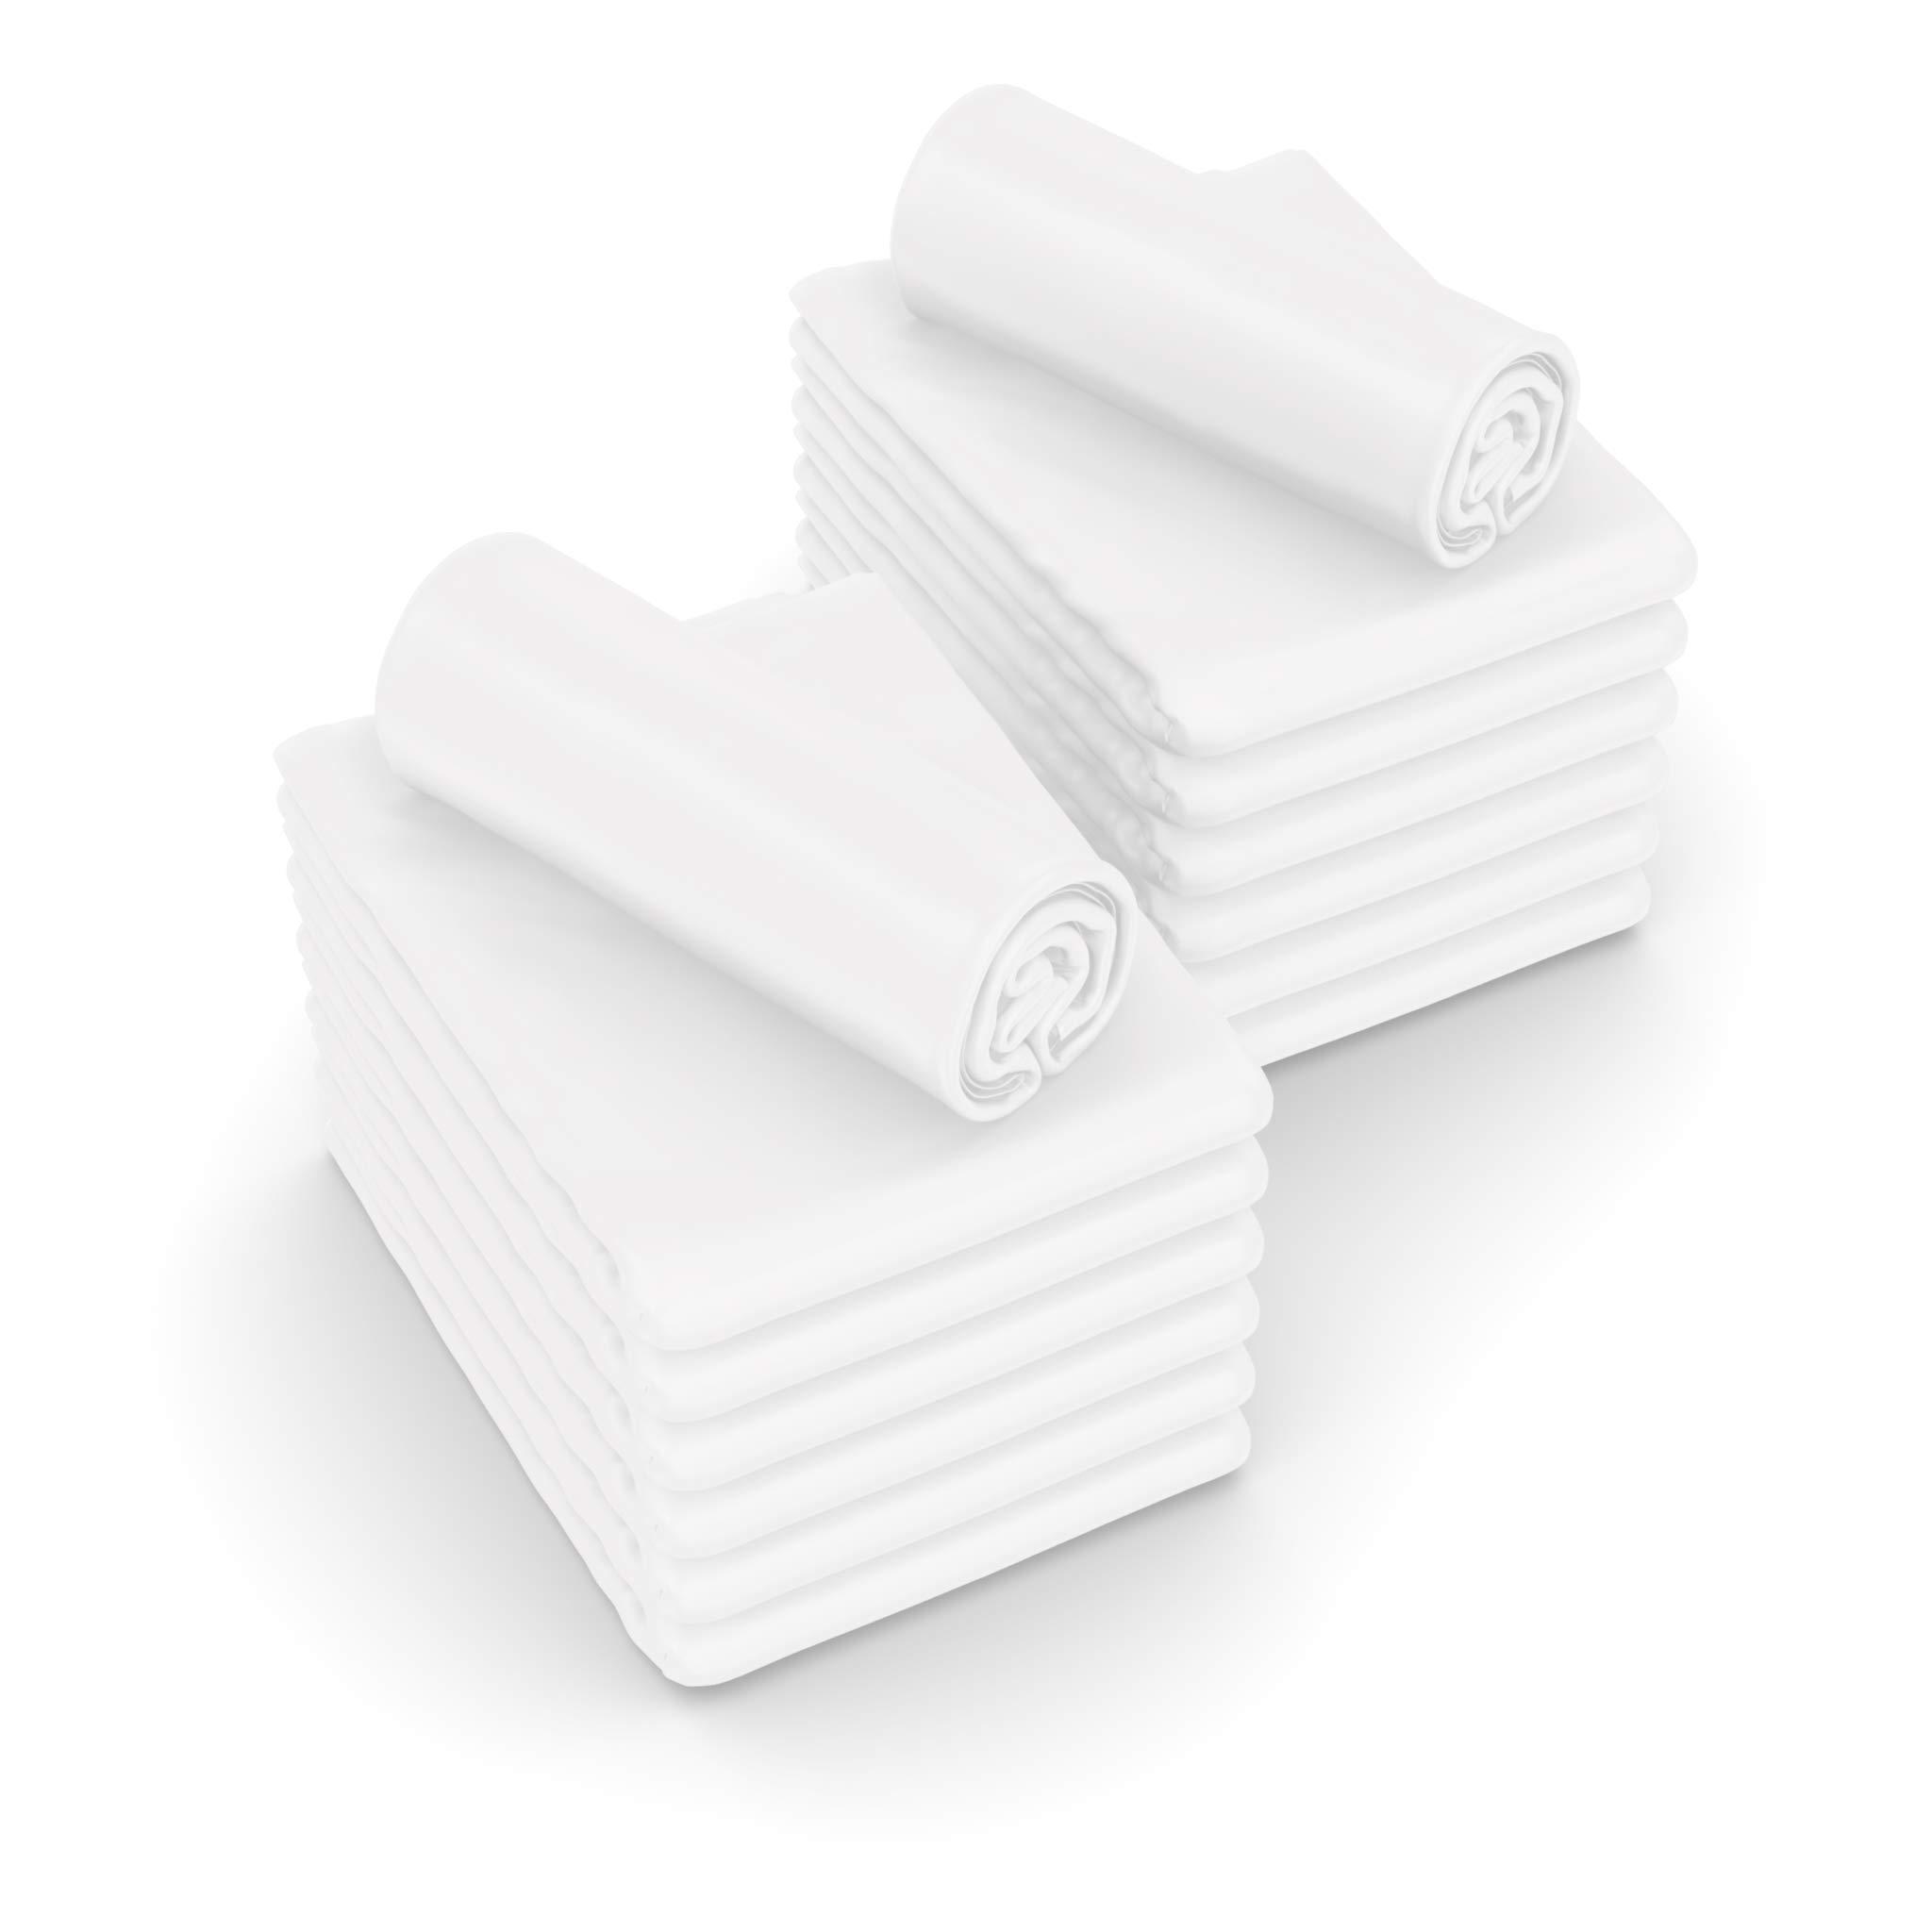 JMR Flat Draw Bed Sheets Muslin T130 Cotton Blend (66x104, White 4 Piece)